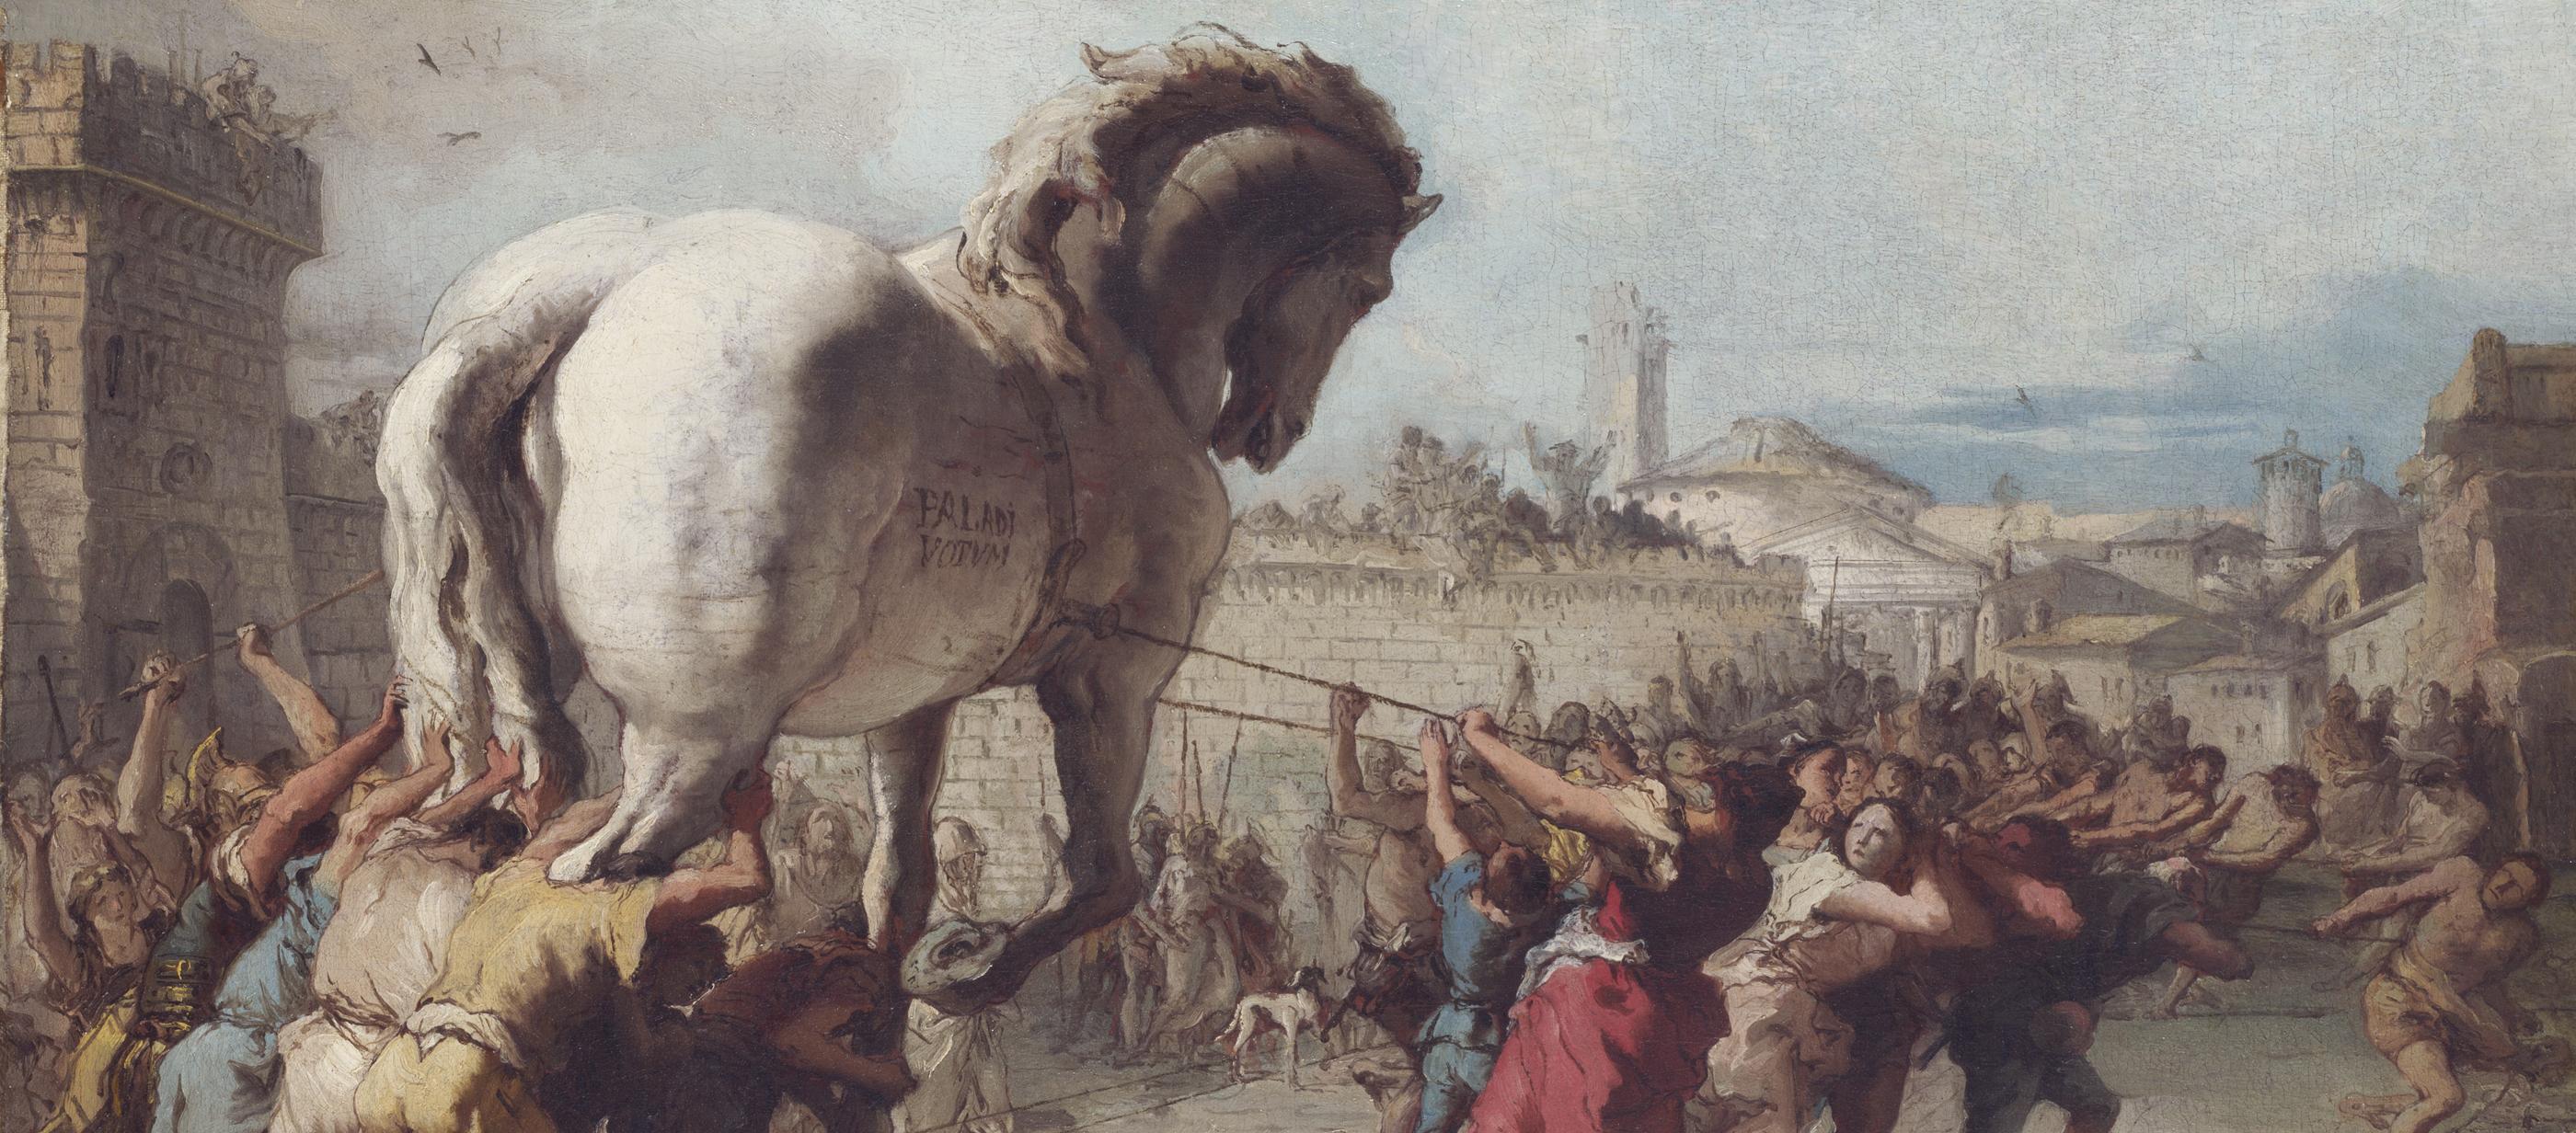 The Procession of the Trojan Horse into Troy, by Giovanni Domenico Tiepolo, c. 1760.